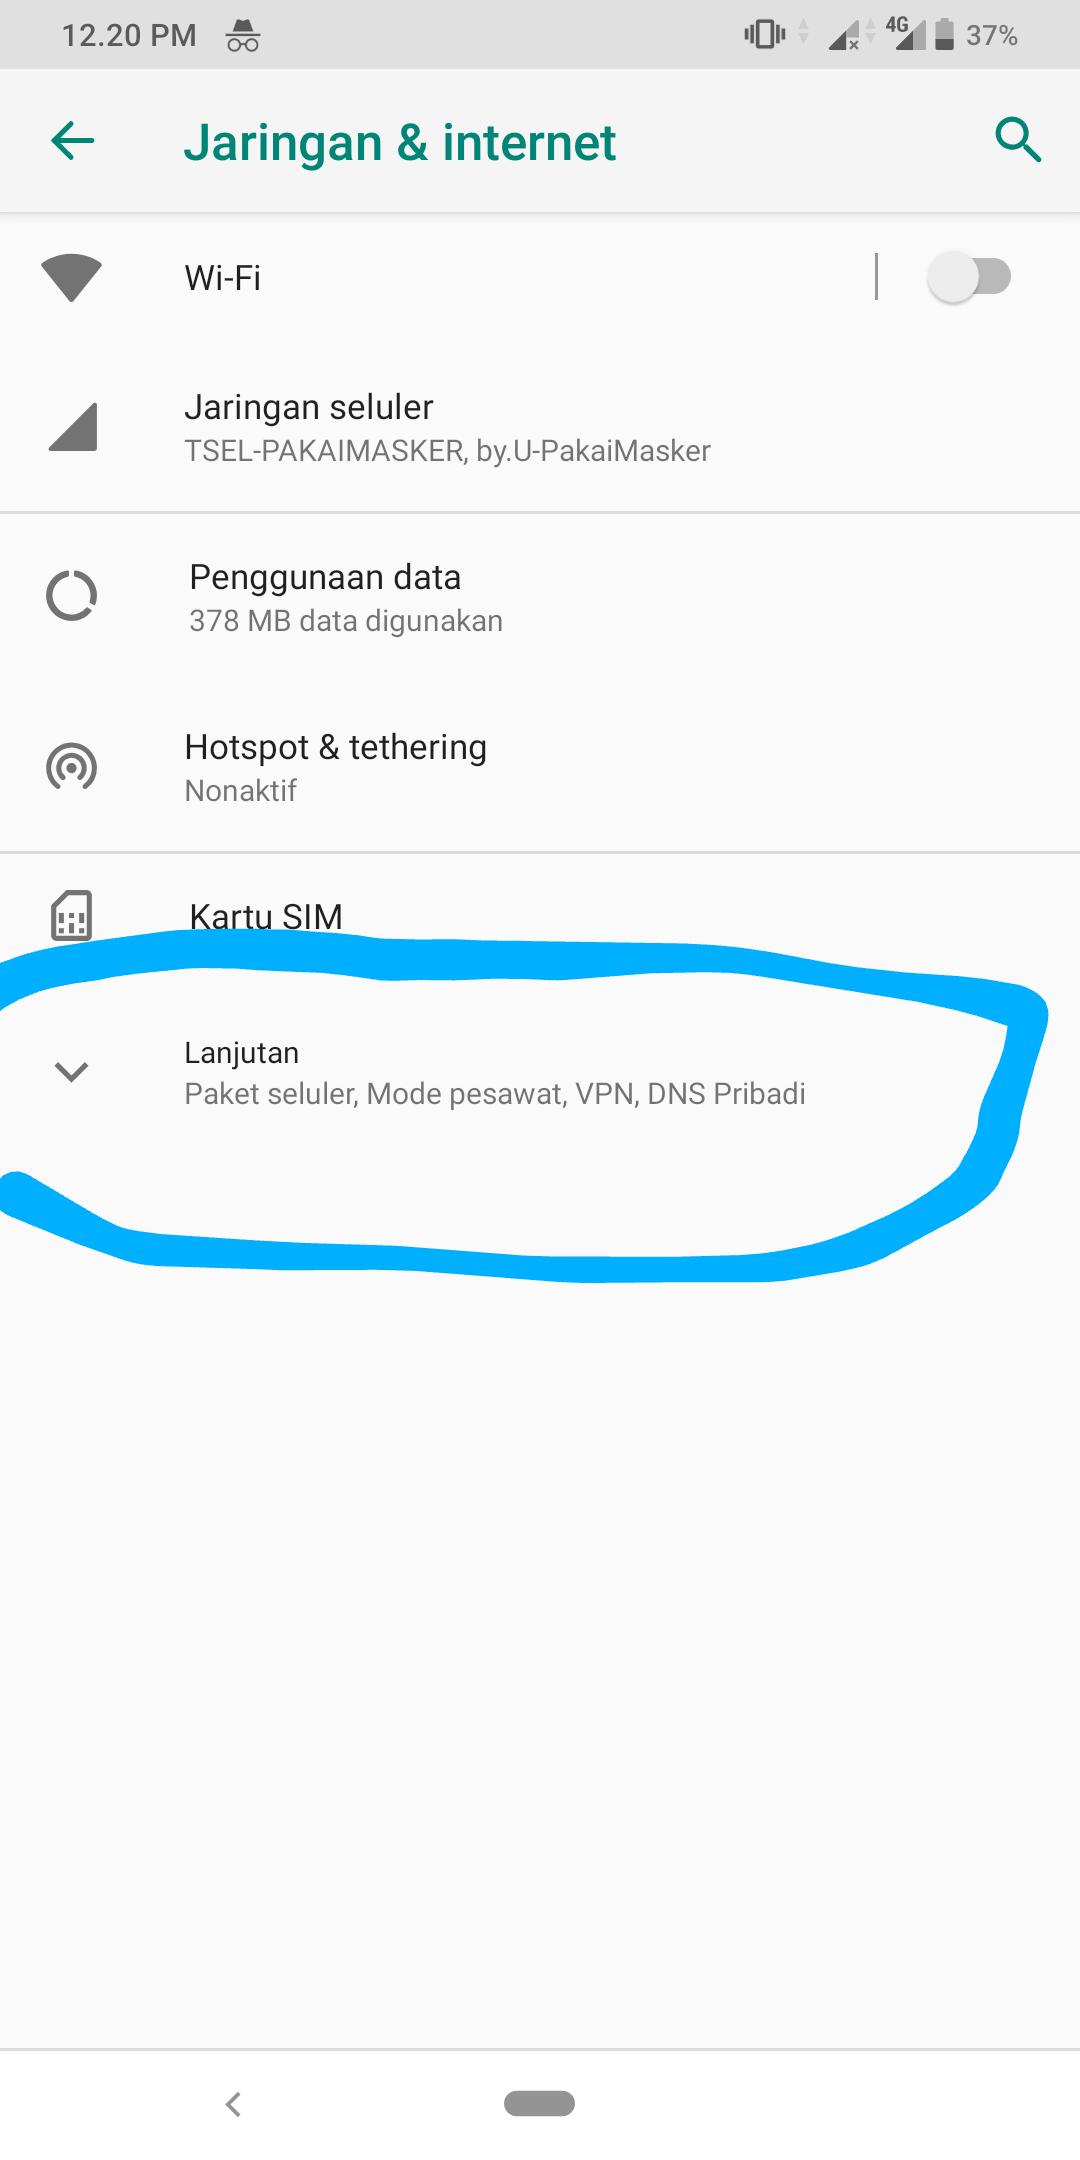 Cara Setting DNS 1.1.1.1 Cloudflare Di Android Tanpa Root